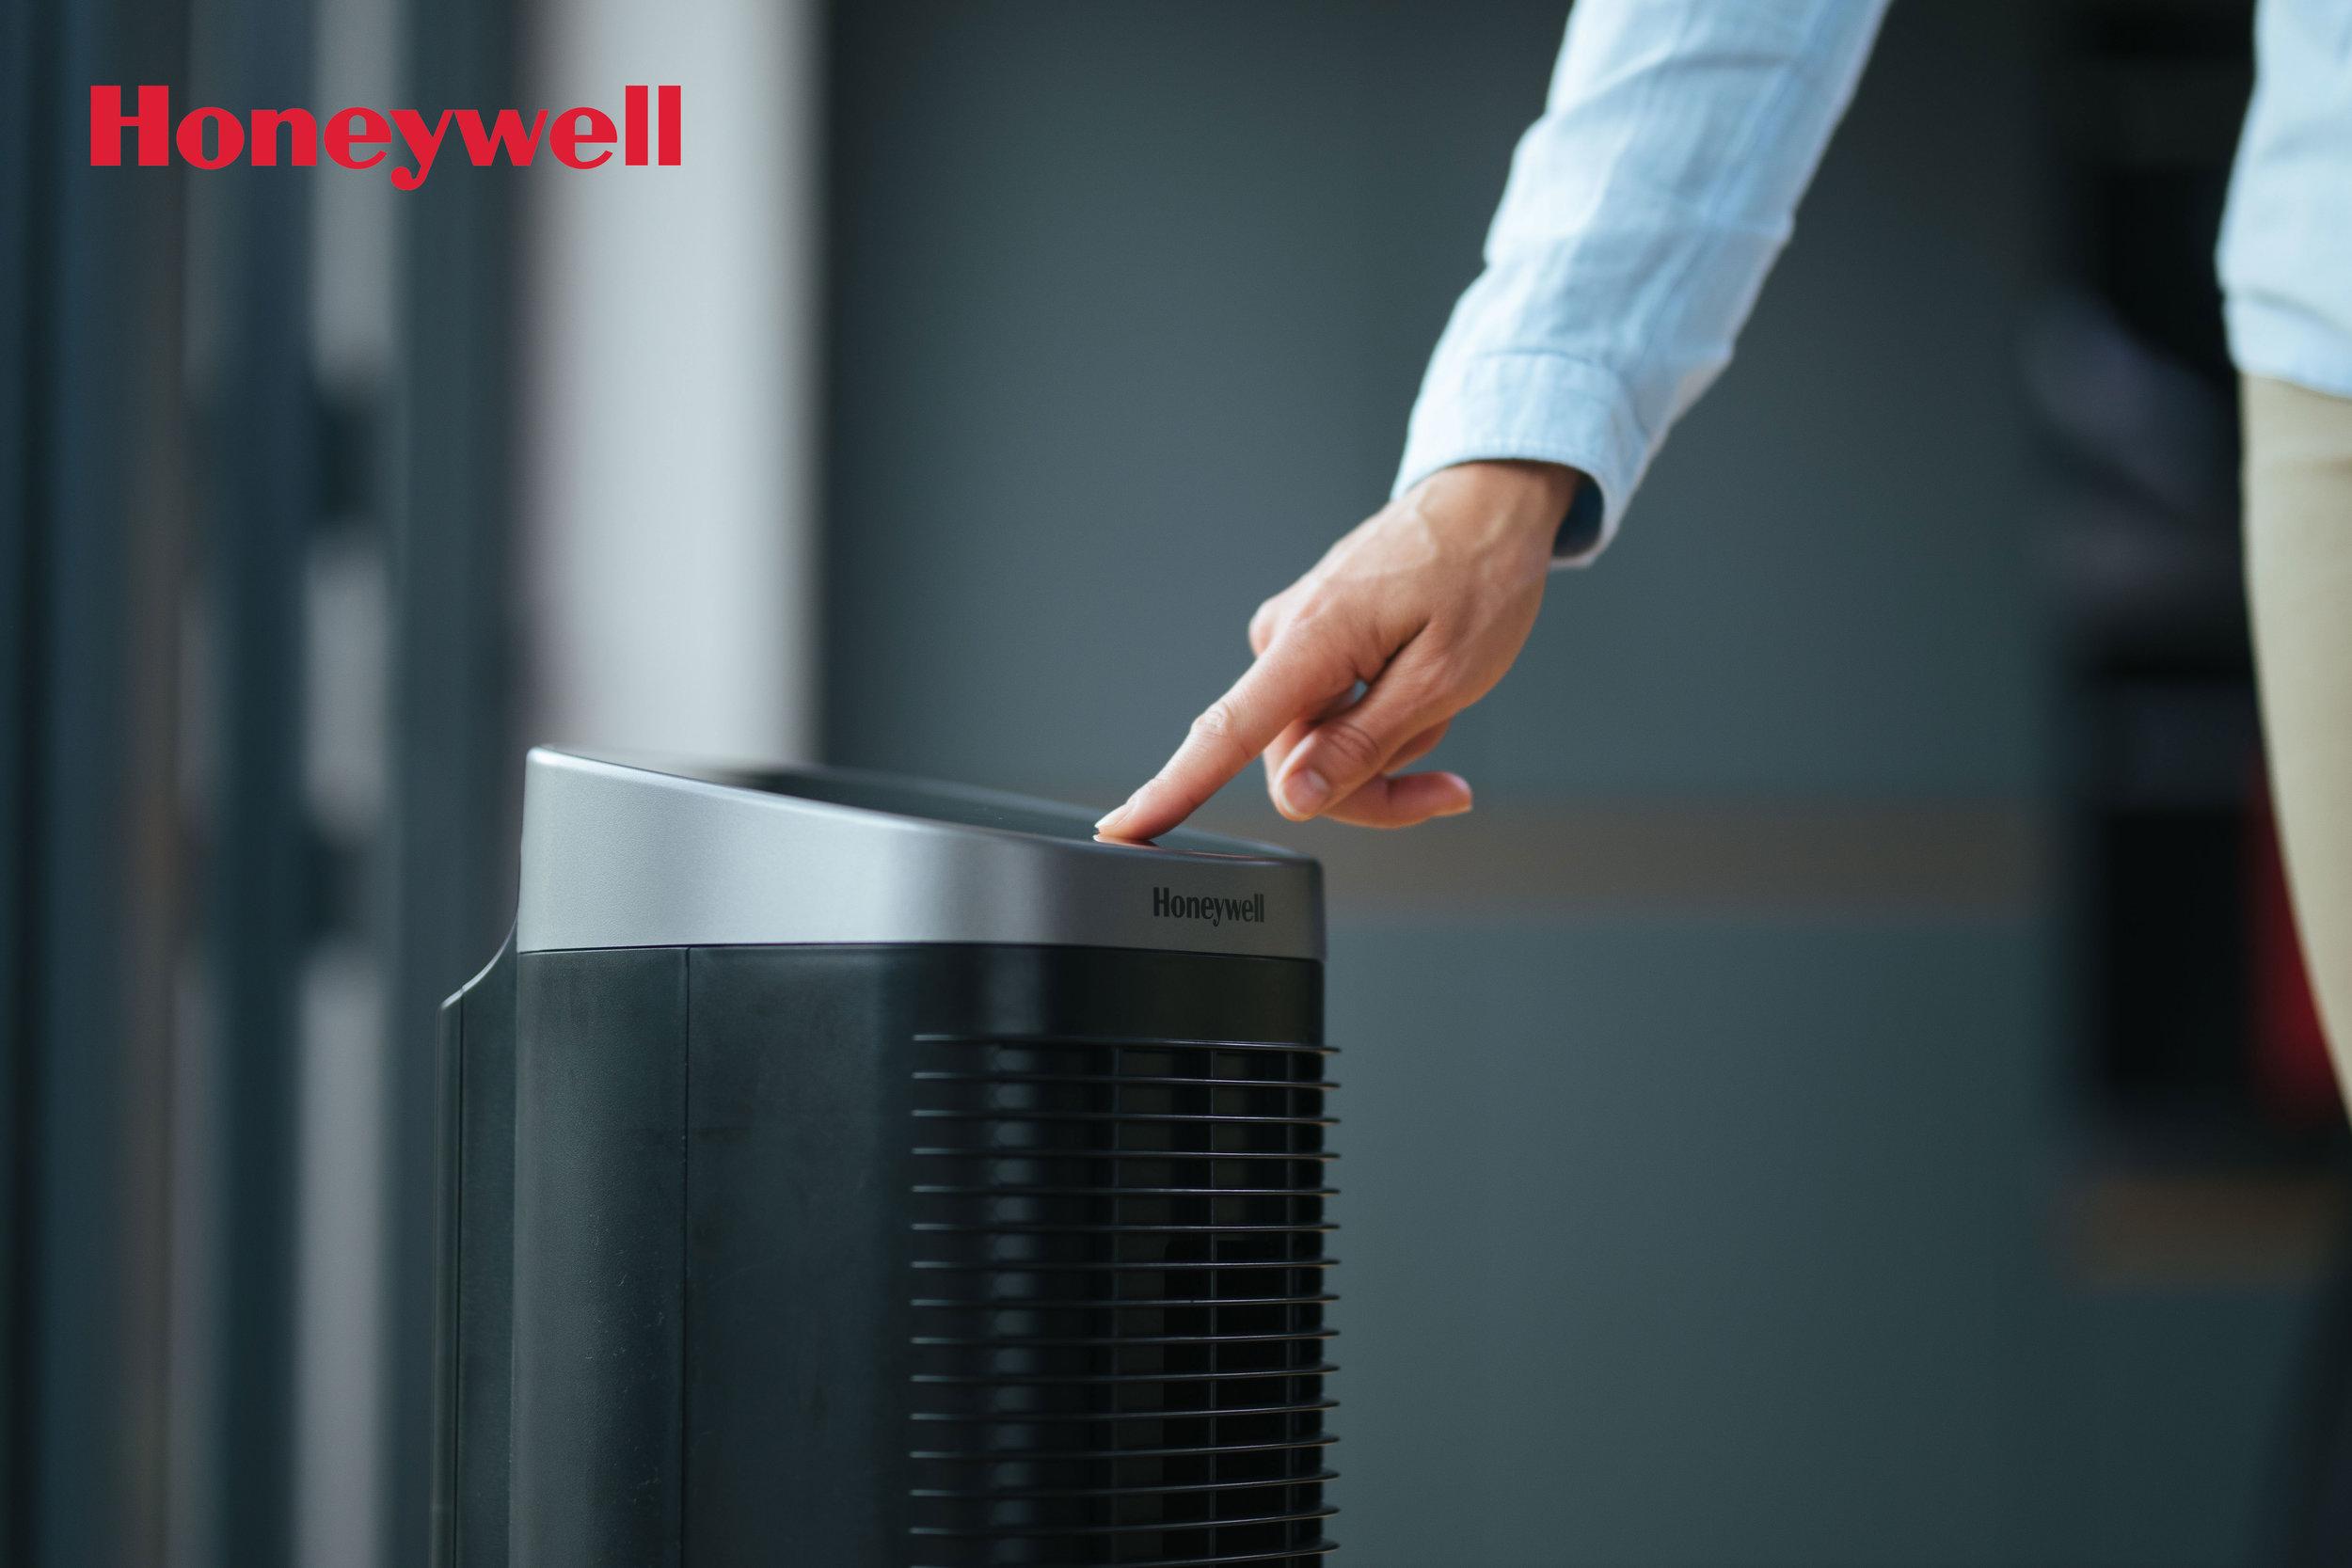 Honeywell-4353-with-logo.jpg